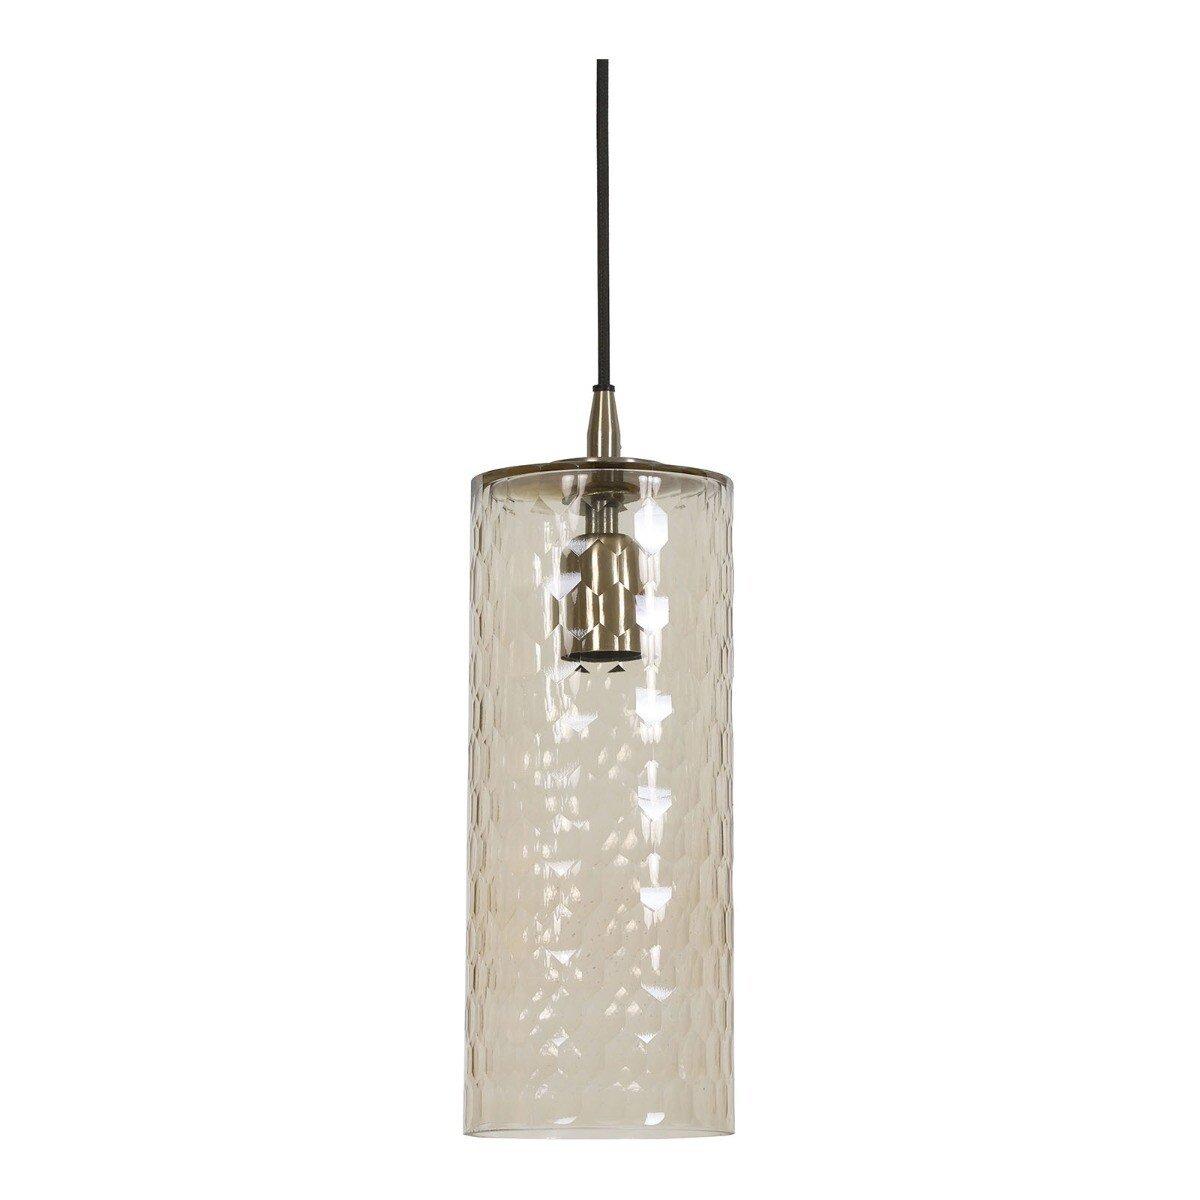 Light & Living Hanglamp DYLANA glas antiek brons M